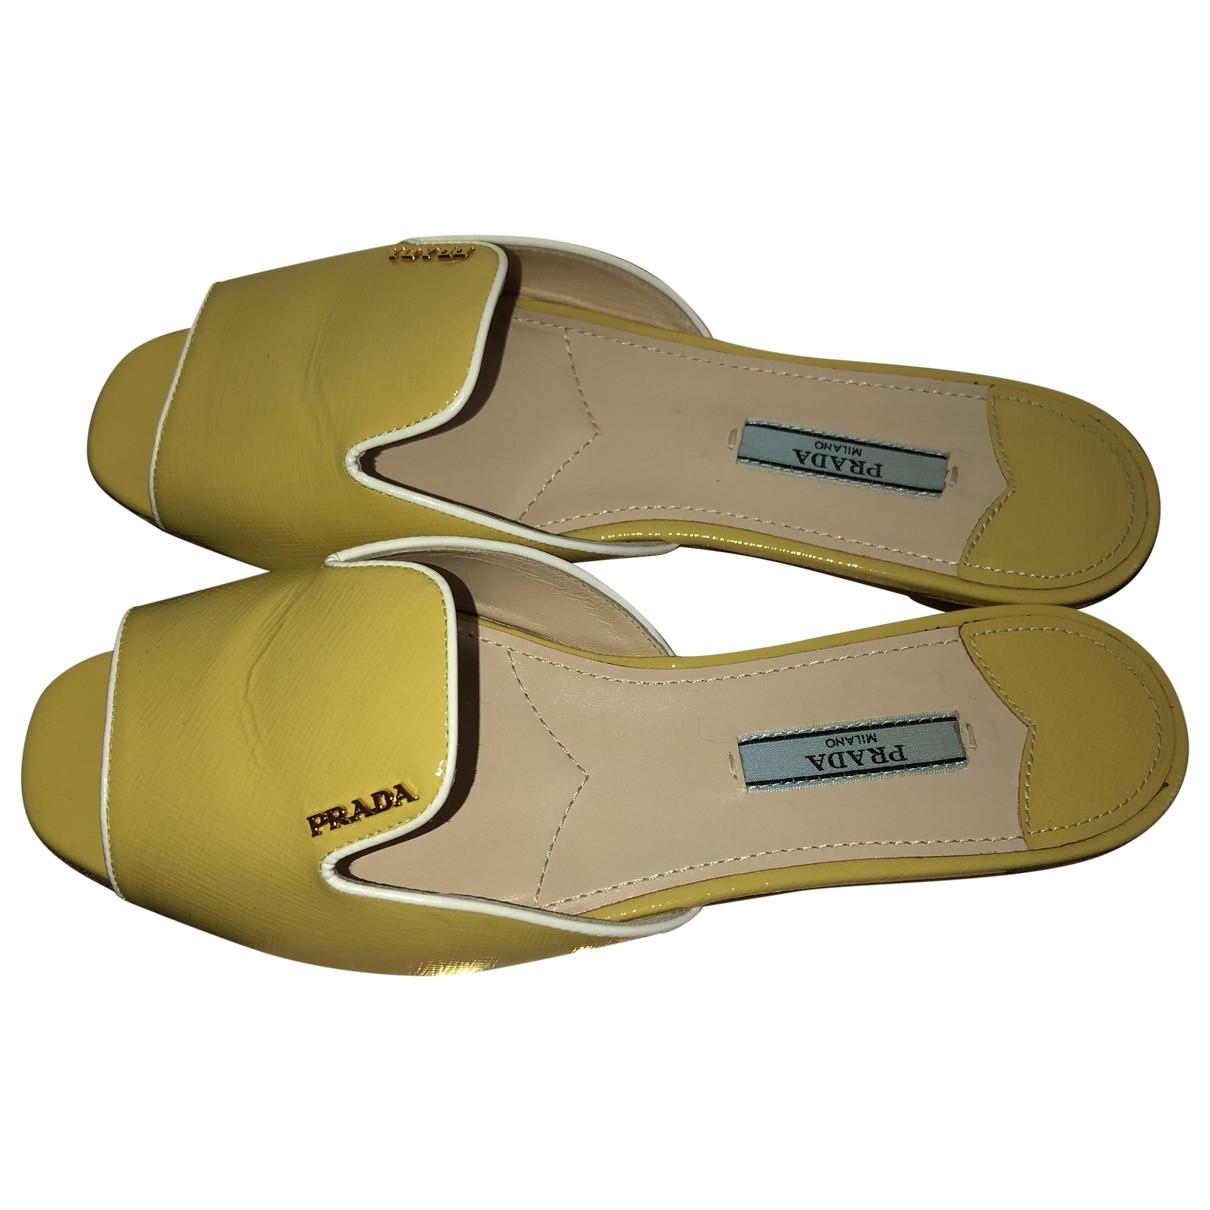 Prada \N Yellow Patent leather Sandals for Women 36 EU